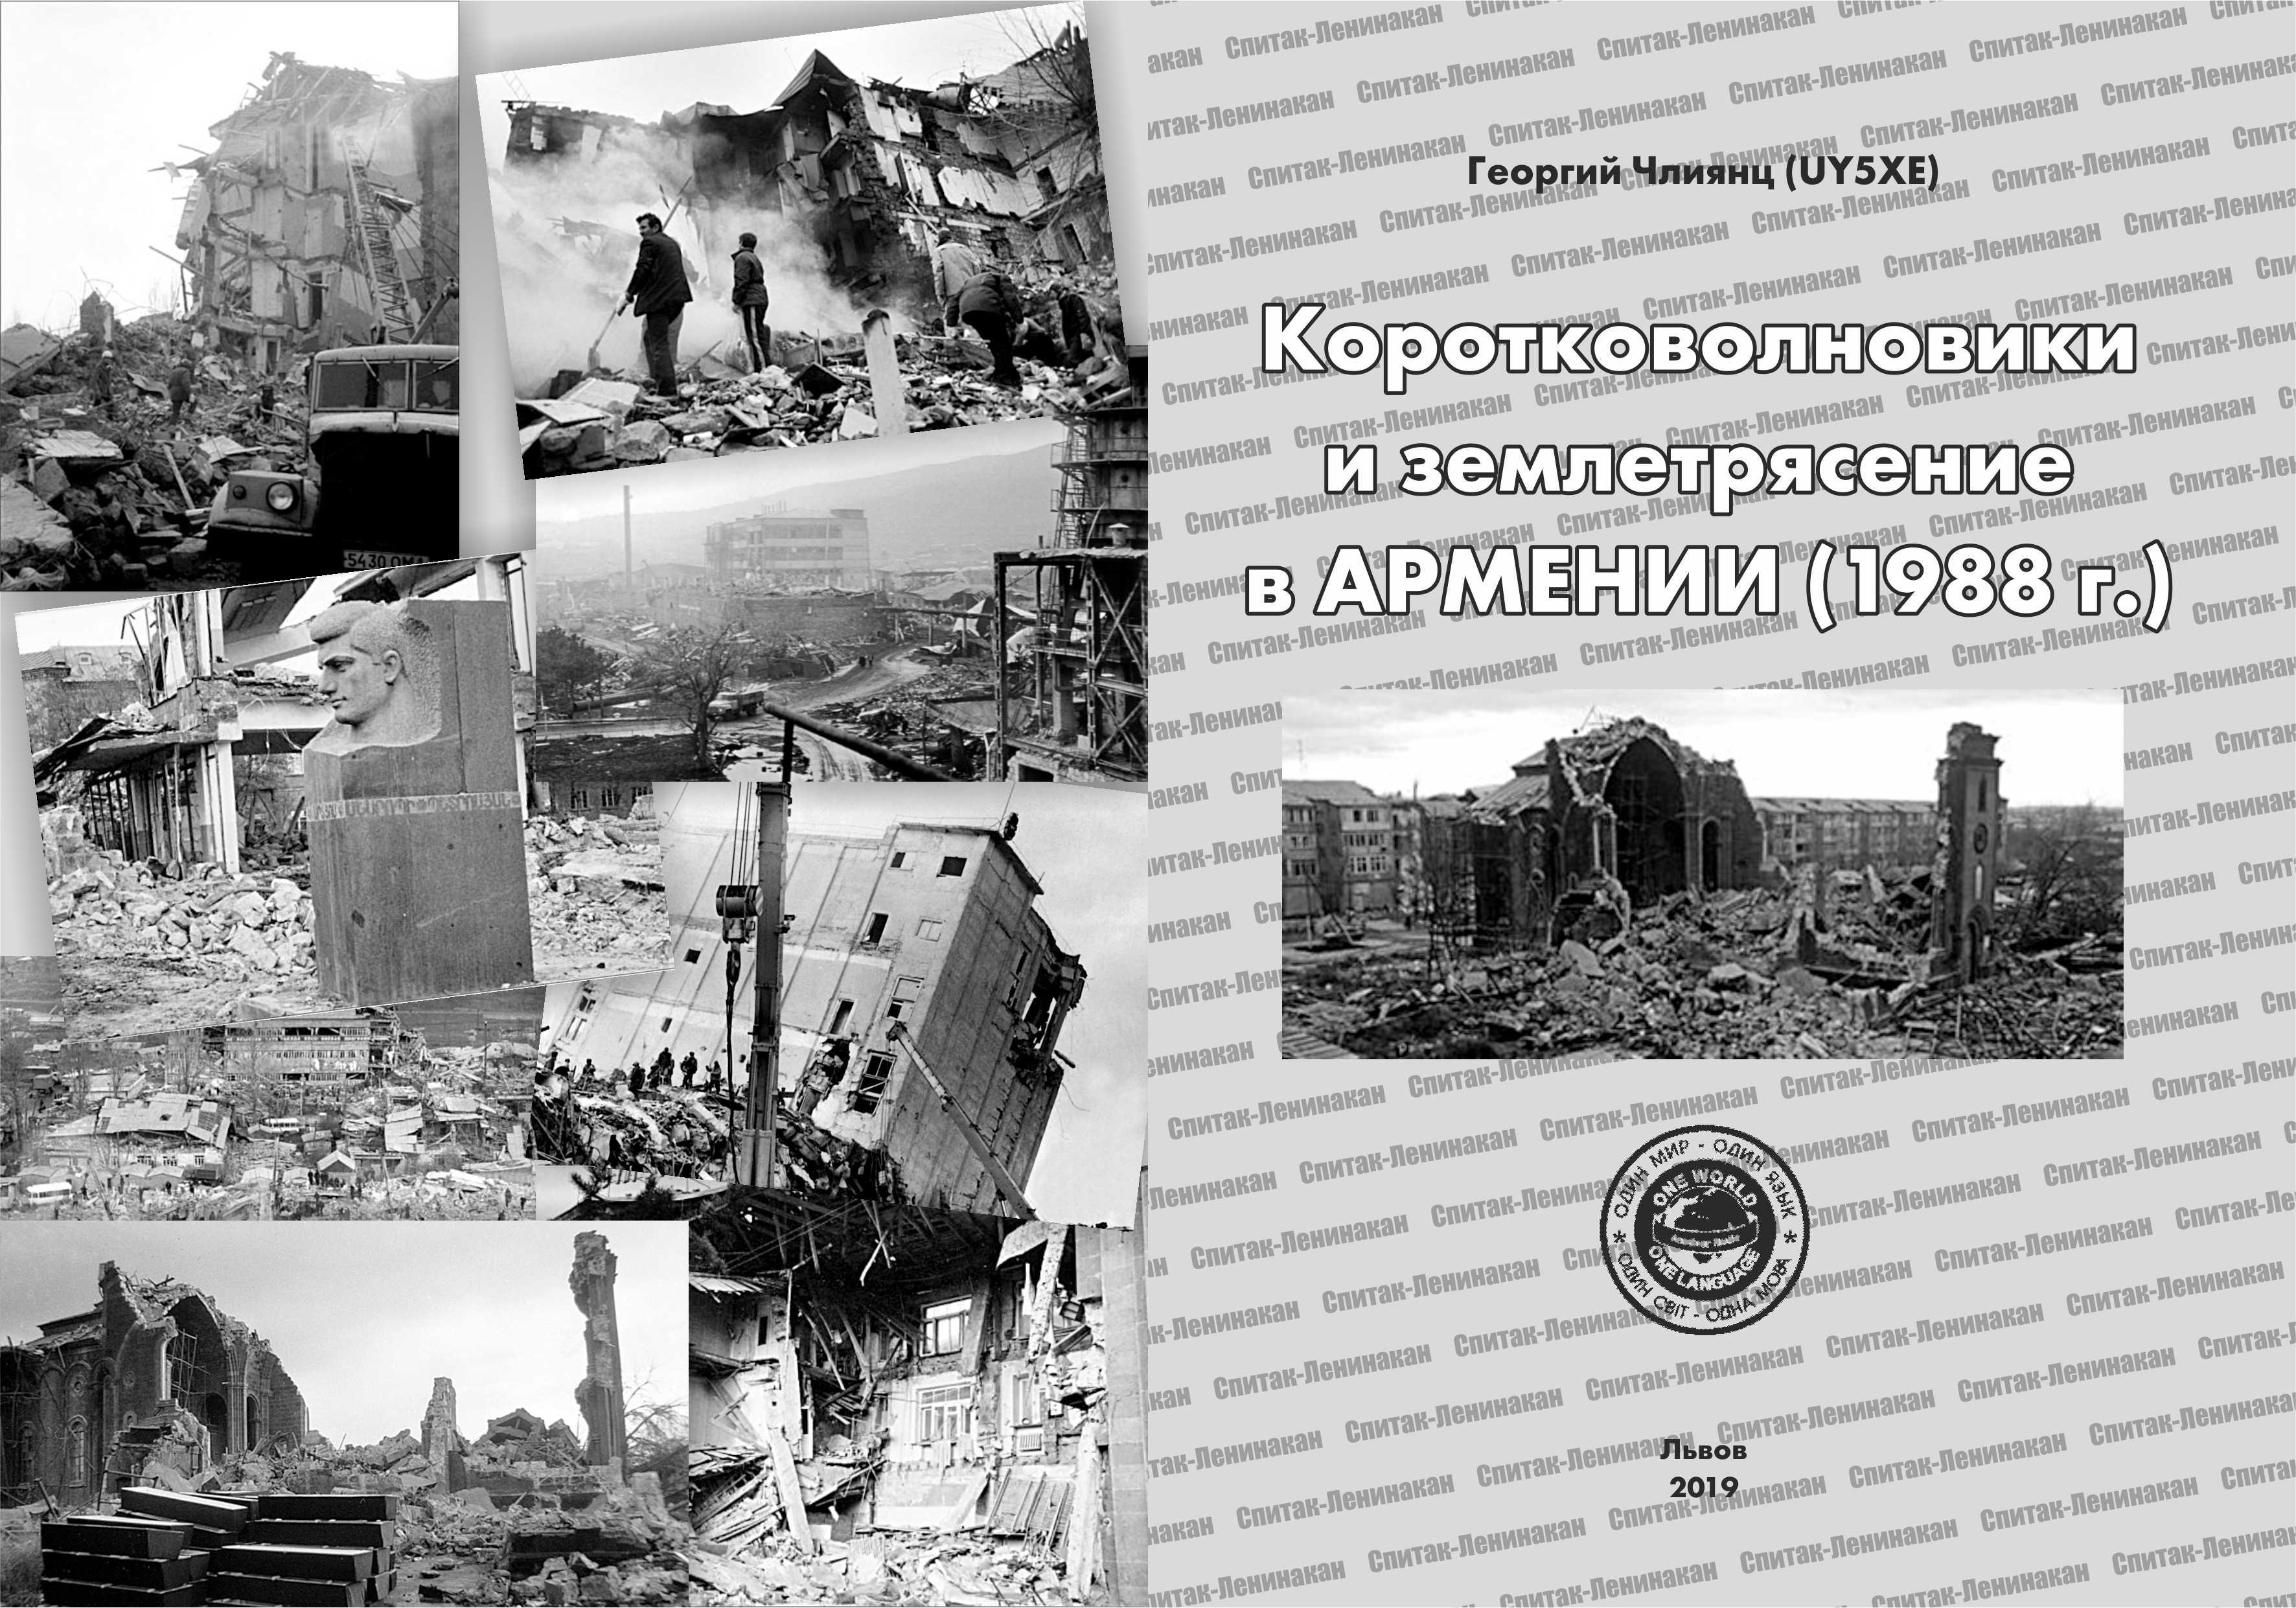 Нажмите на изображение для увеличения.  Название:Oblozhka-knigaLeninakan1.jpg Просмотров:16 Размер:828.6 Кб ID:227600